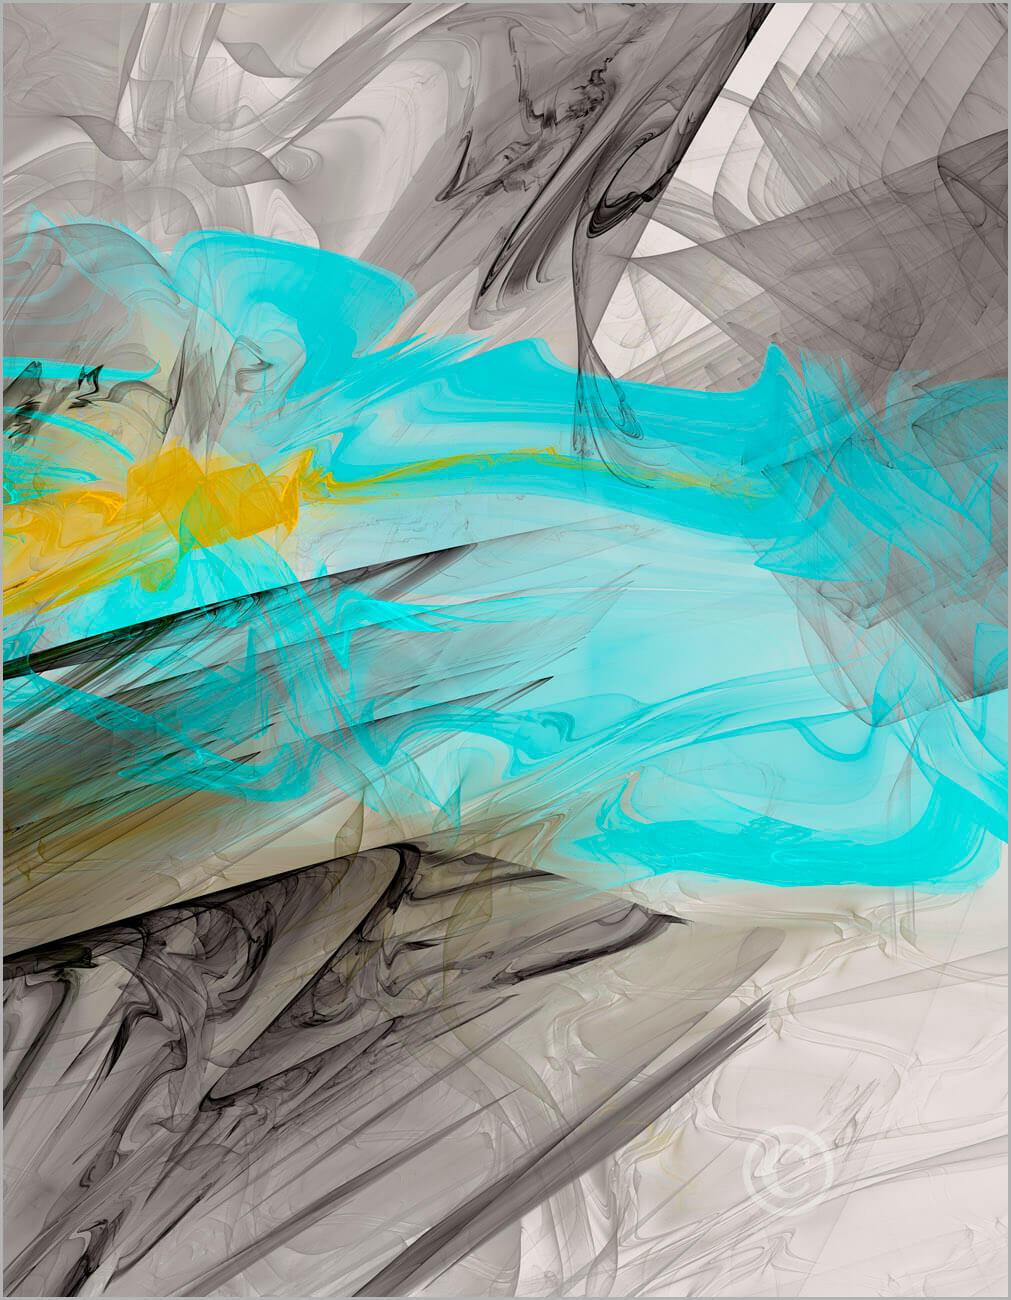 Colortrails_F2_7022_M